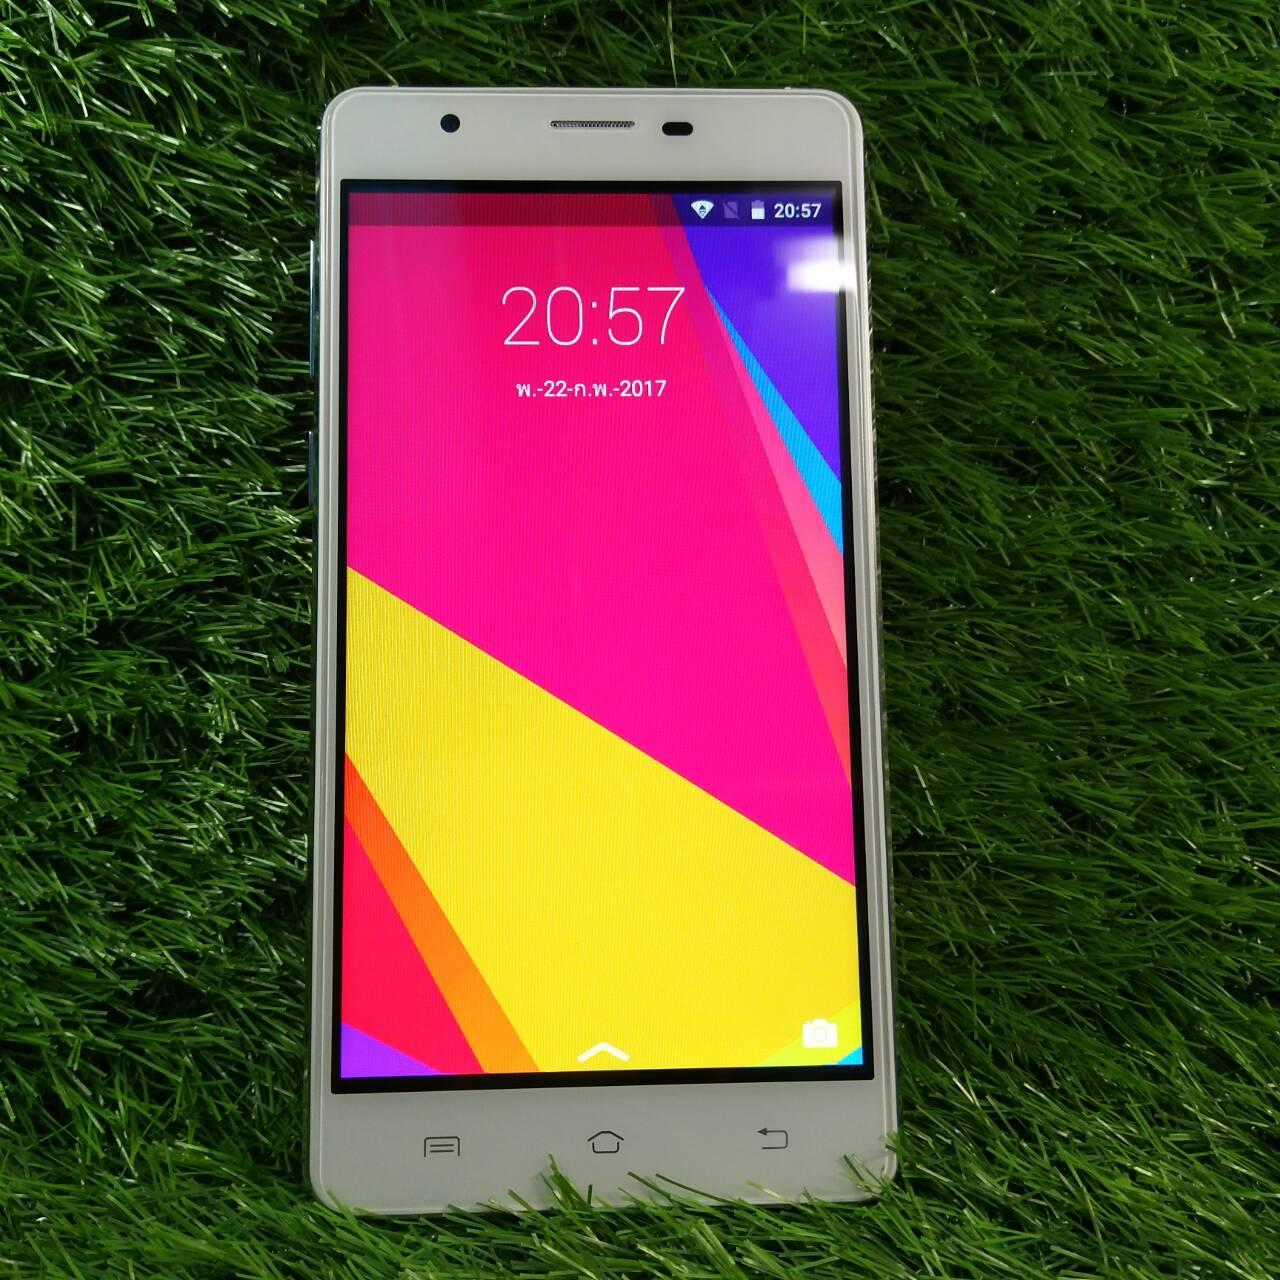 TWZ Y57 3G 8GB ฟรี เคส+ฟิล์ม